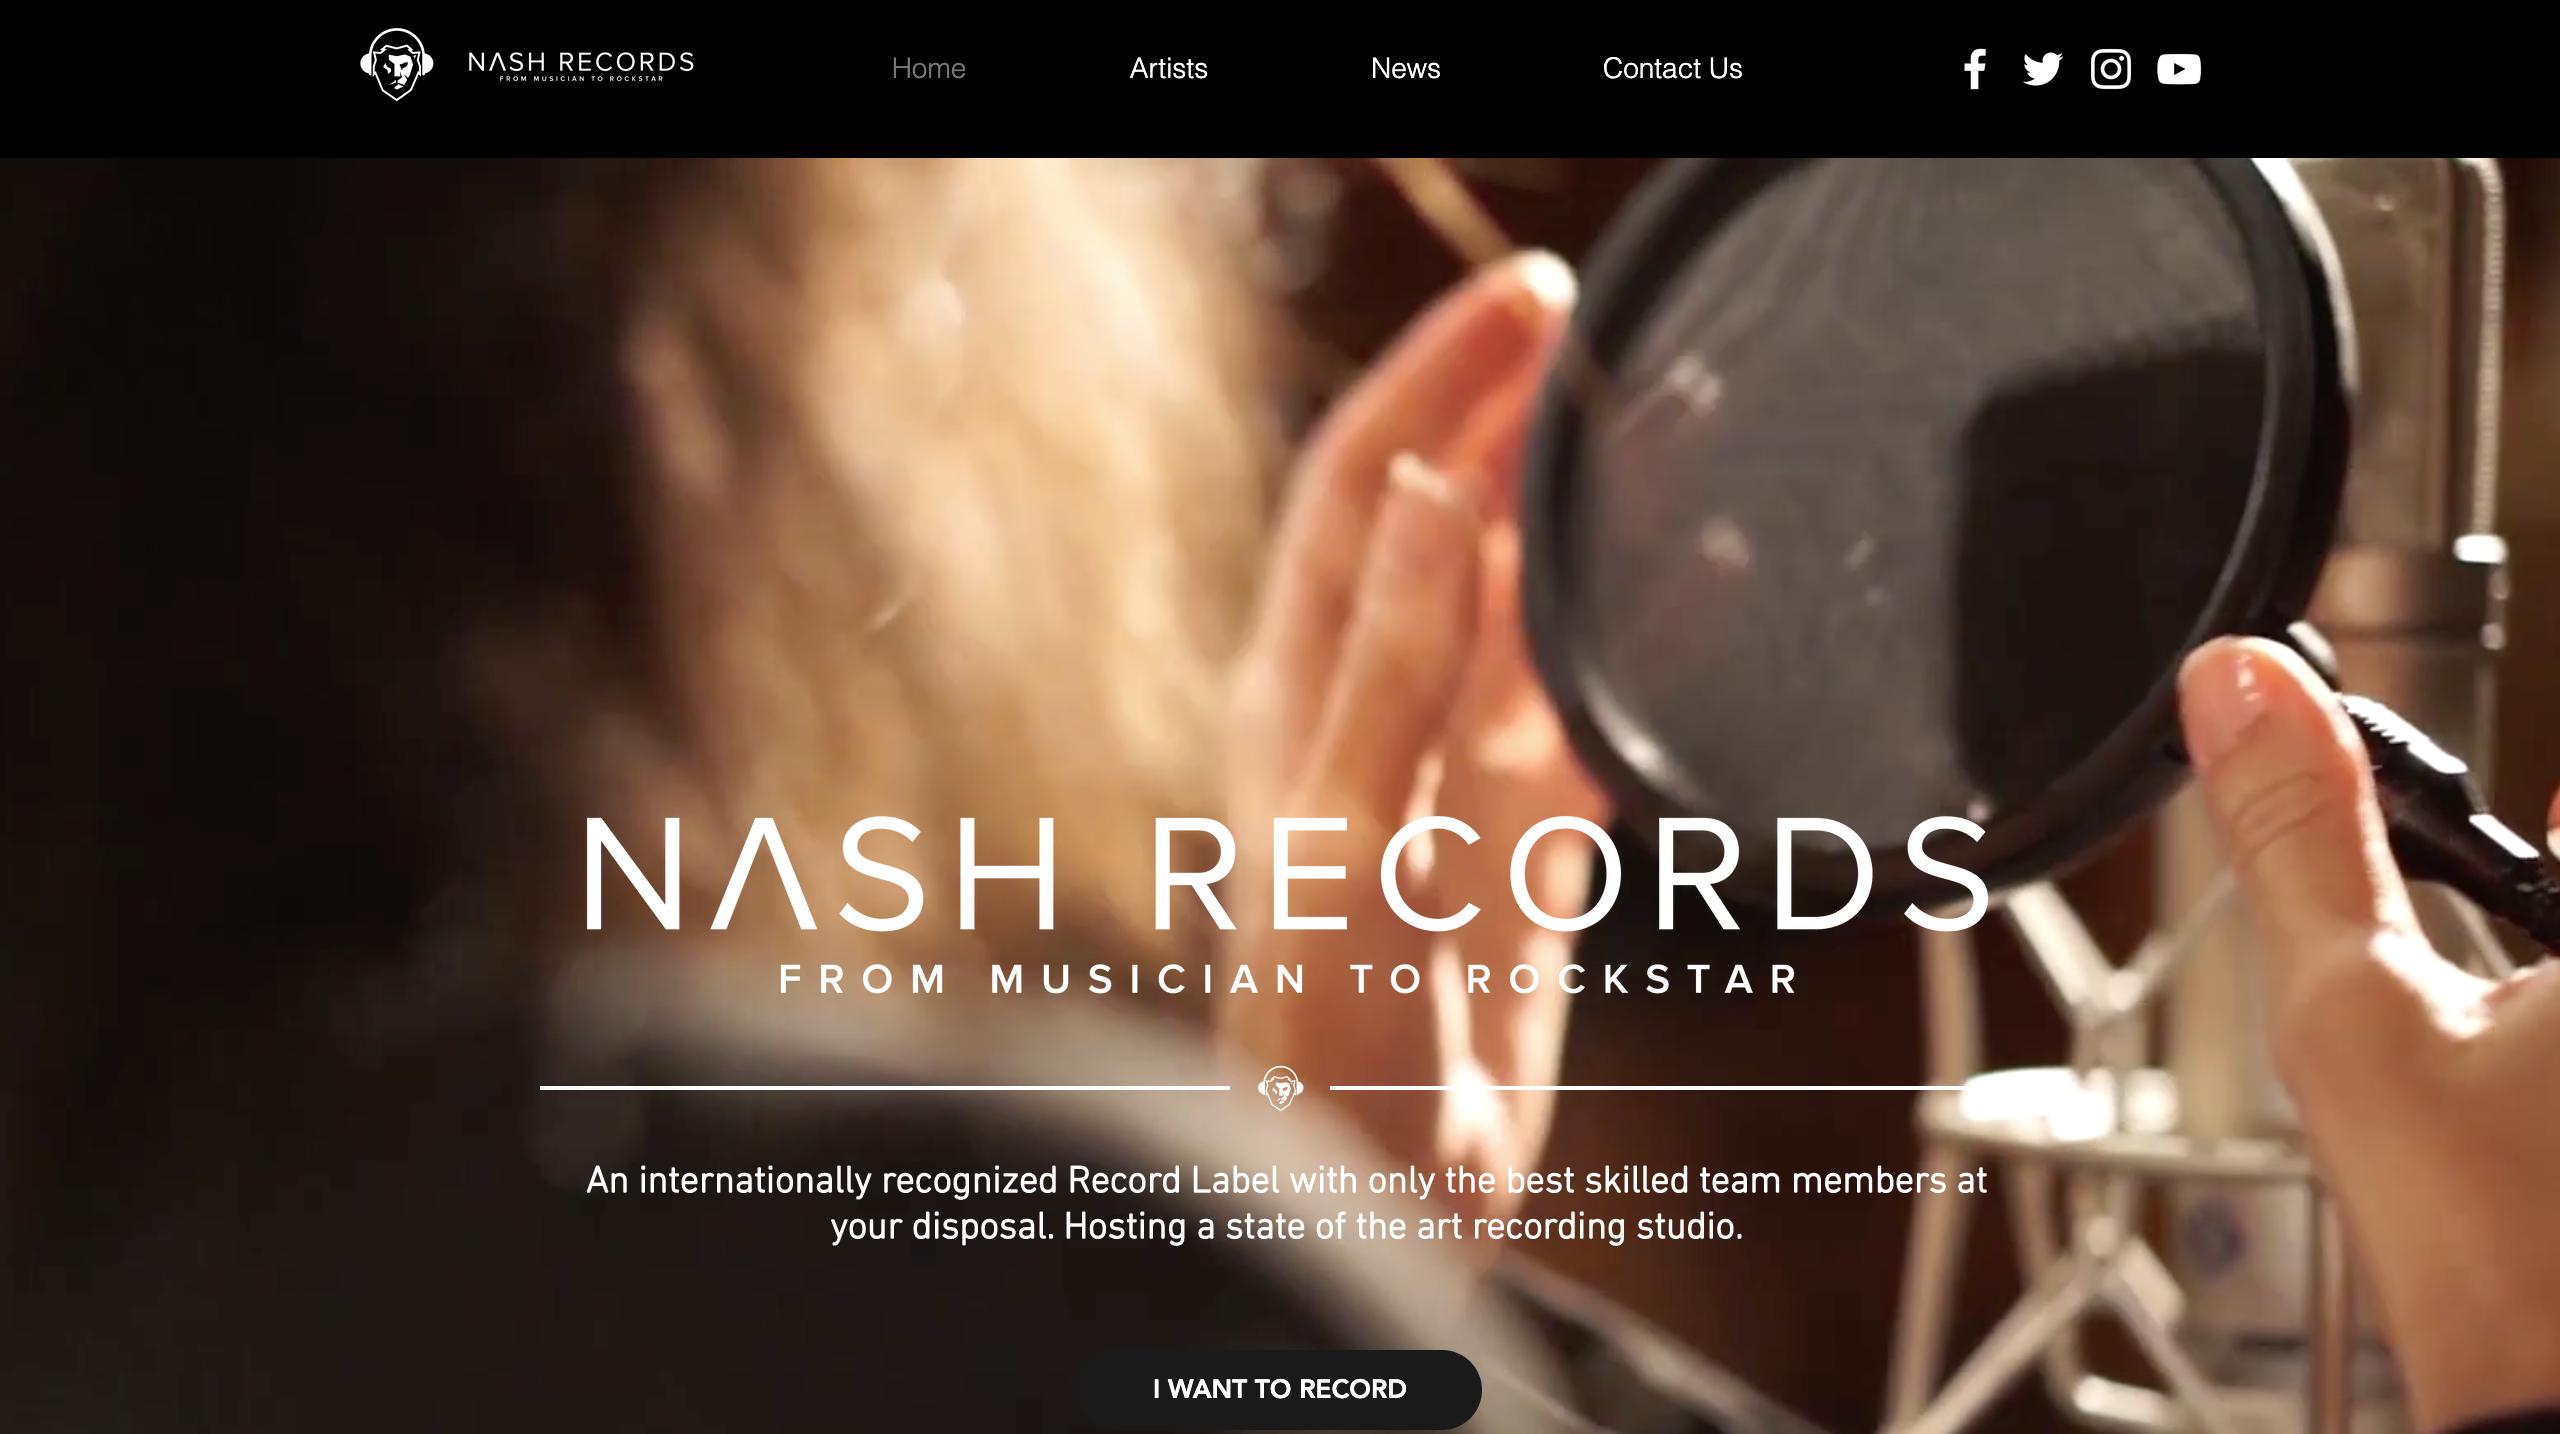 Nash Records